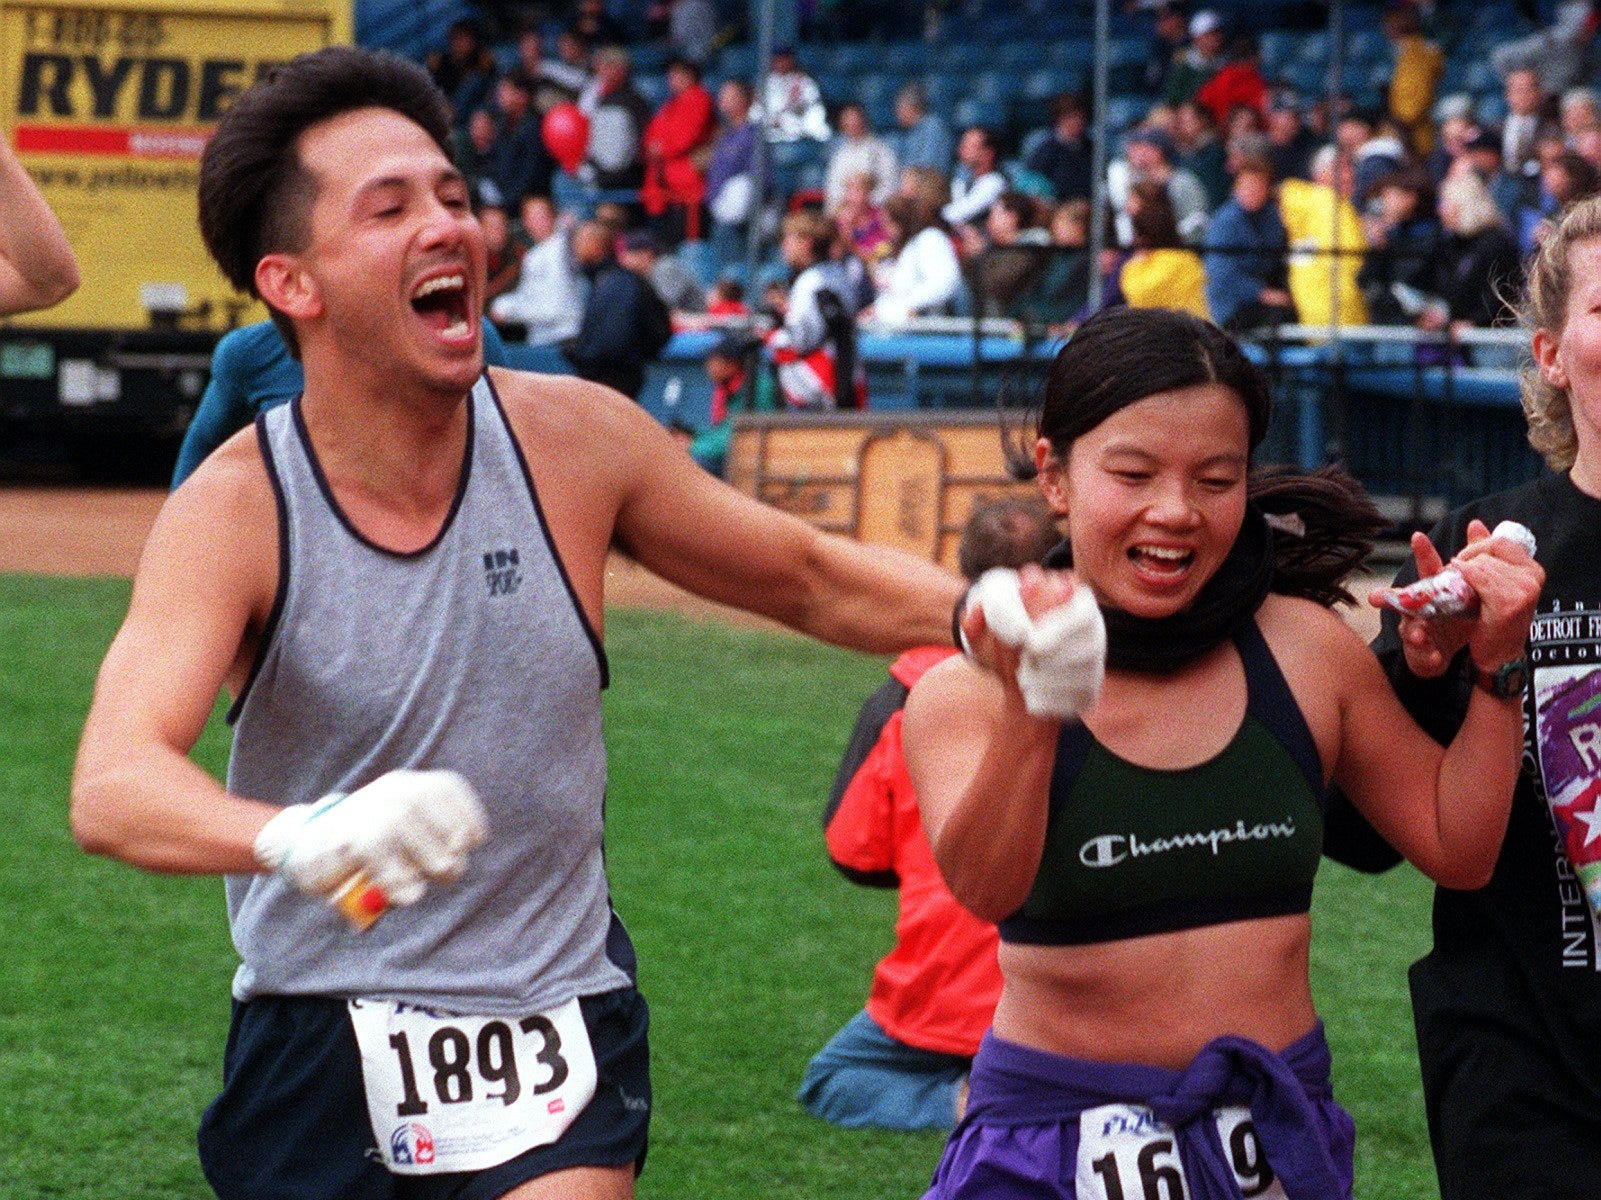 James Yee celebrates with Sarah Yee as they finish the Detroit Free Press/Flagstar Bank International Marathon Sunday, Oct. 17, 1999, at Tiger Stadium in Detroit.